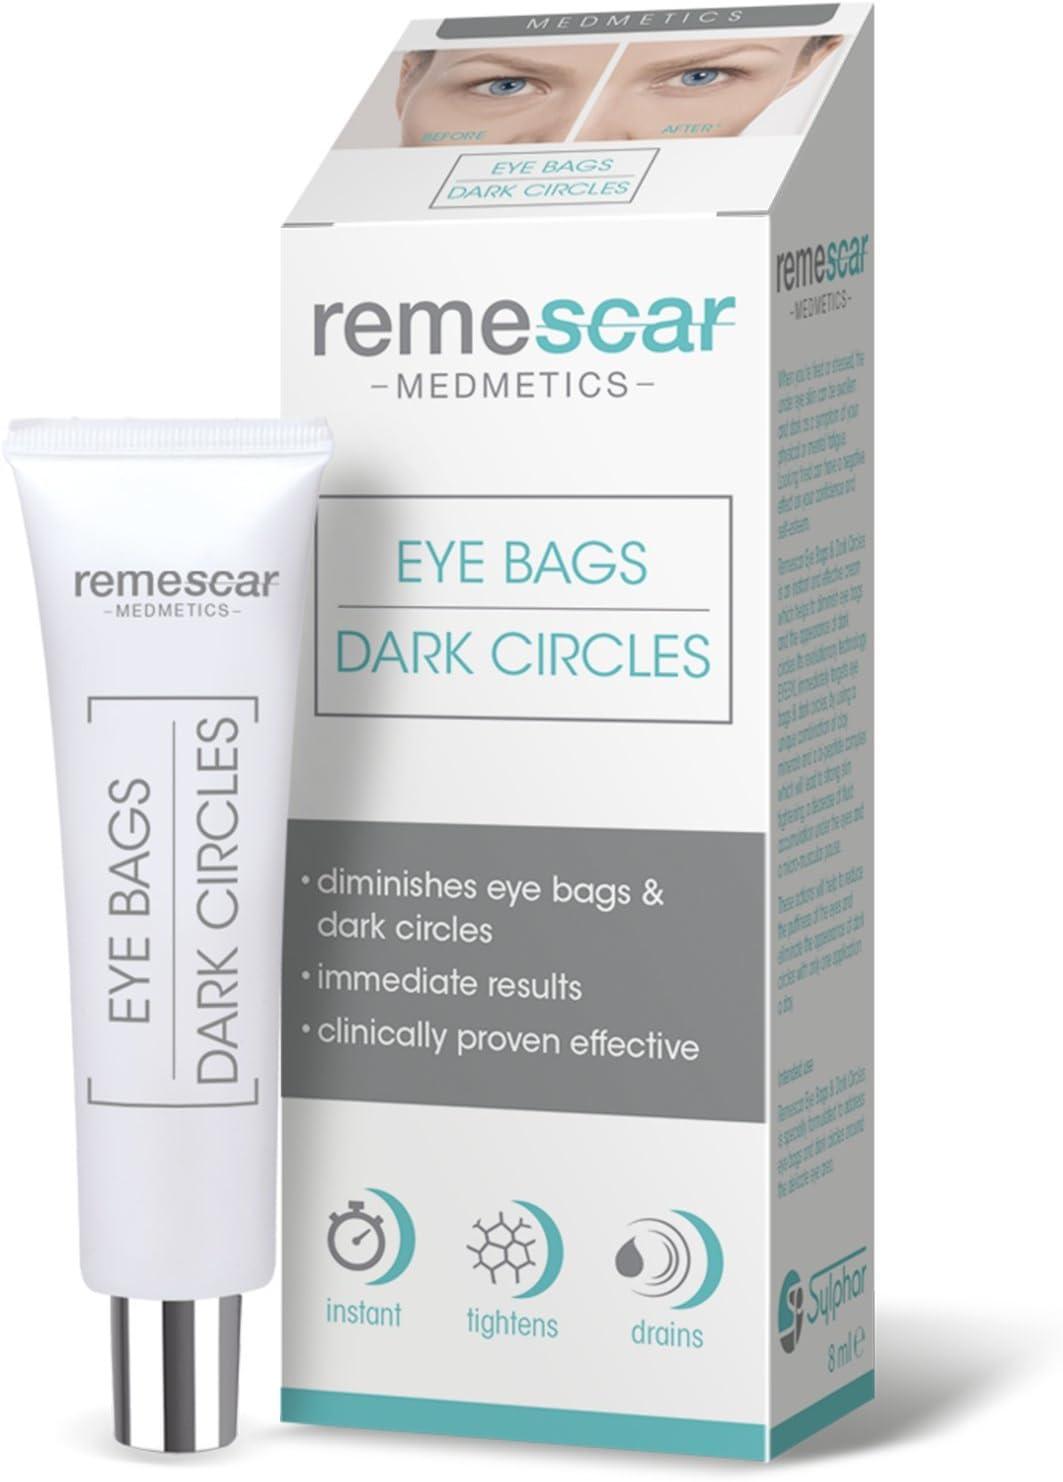 Remescar Eye Bags Dark Circles Cream For Under Eye Bags